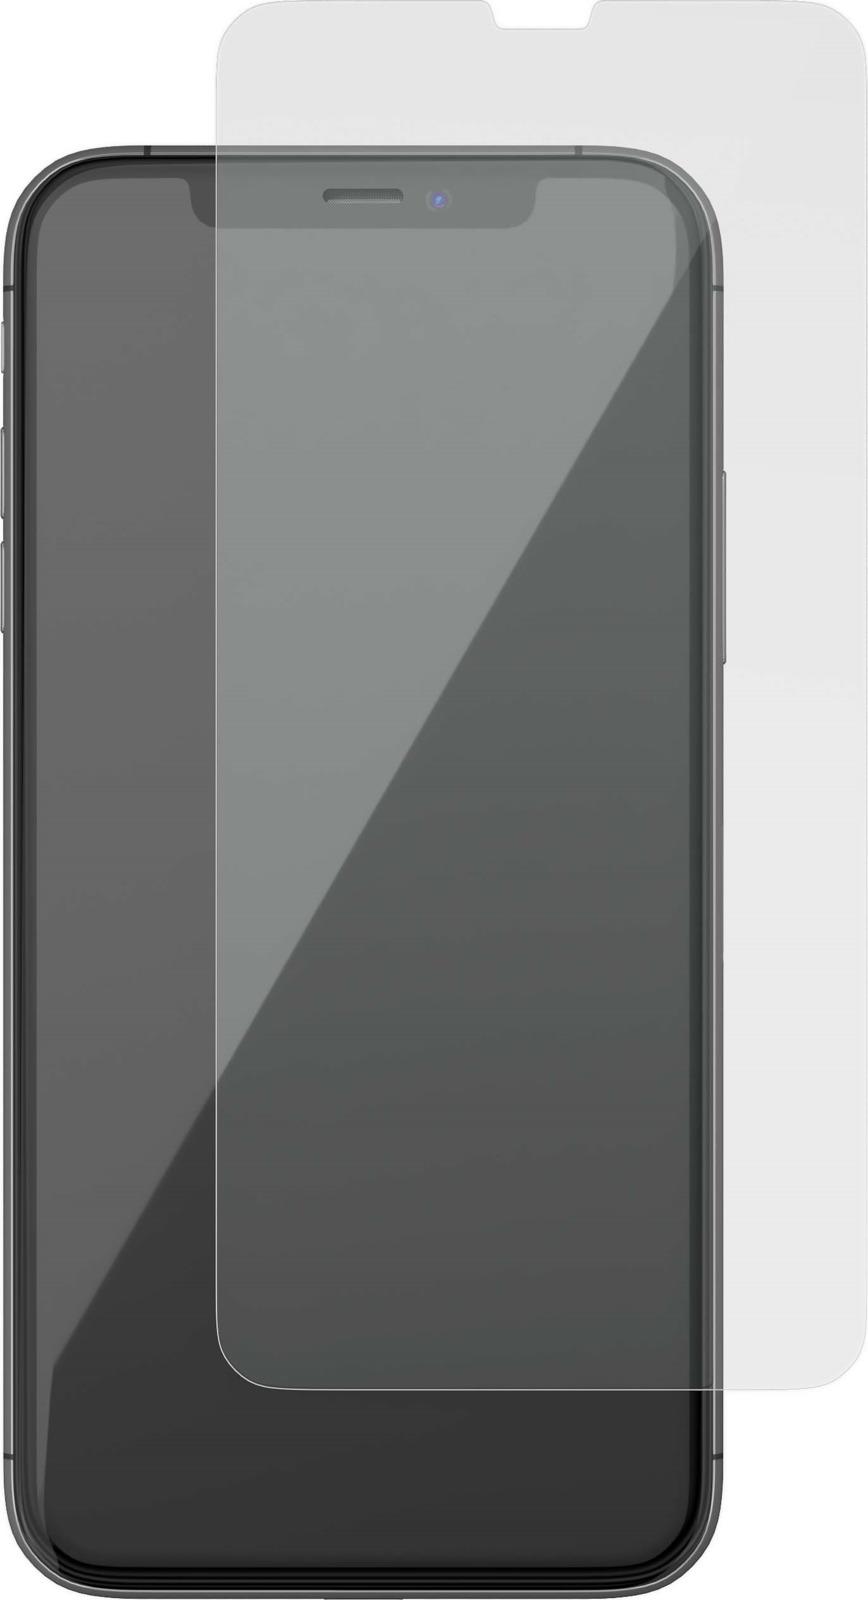 Защитное стекло uBear Premium Glass Screen Protector 0,2 мм для Apple iPhone XS, прозрачный